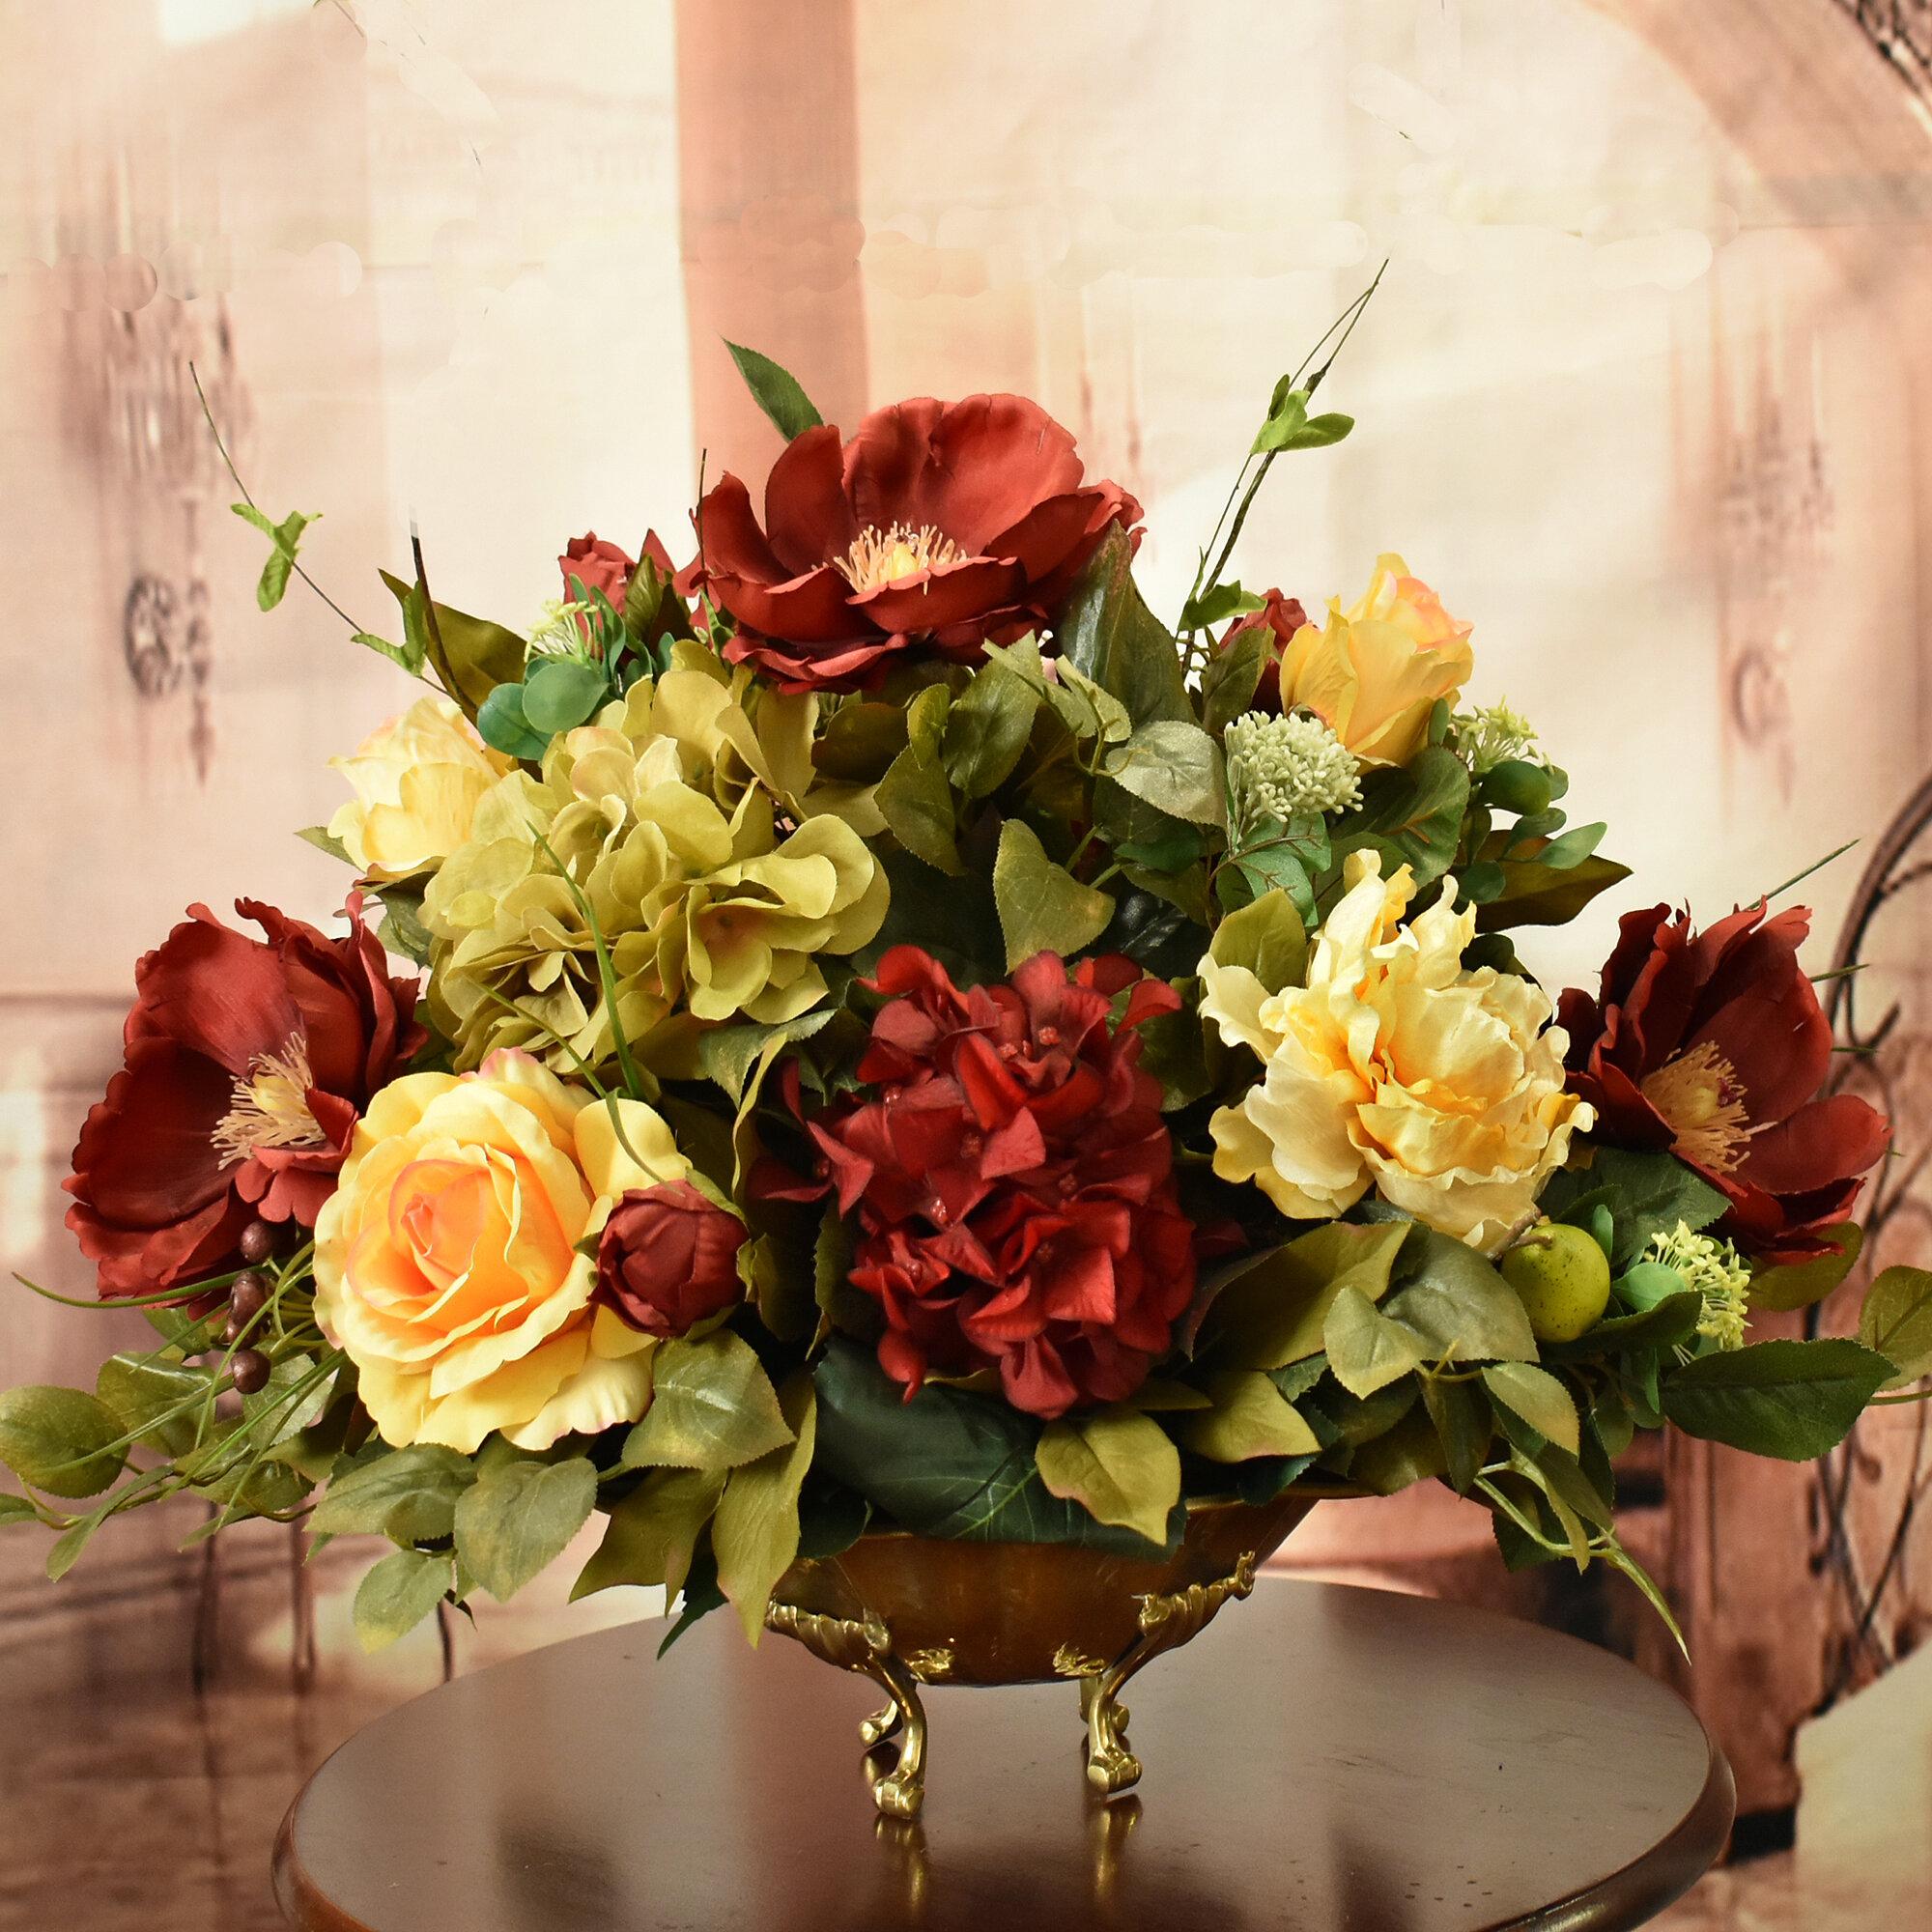 floral home decor magnolias silk floral centerpiece in bowl rh wayfair com silk sunflower arrangements silk floral centerpieces dining table